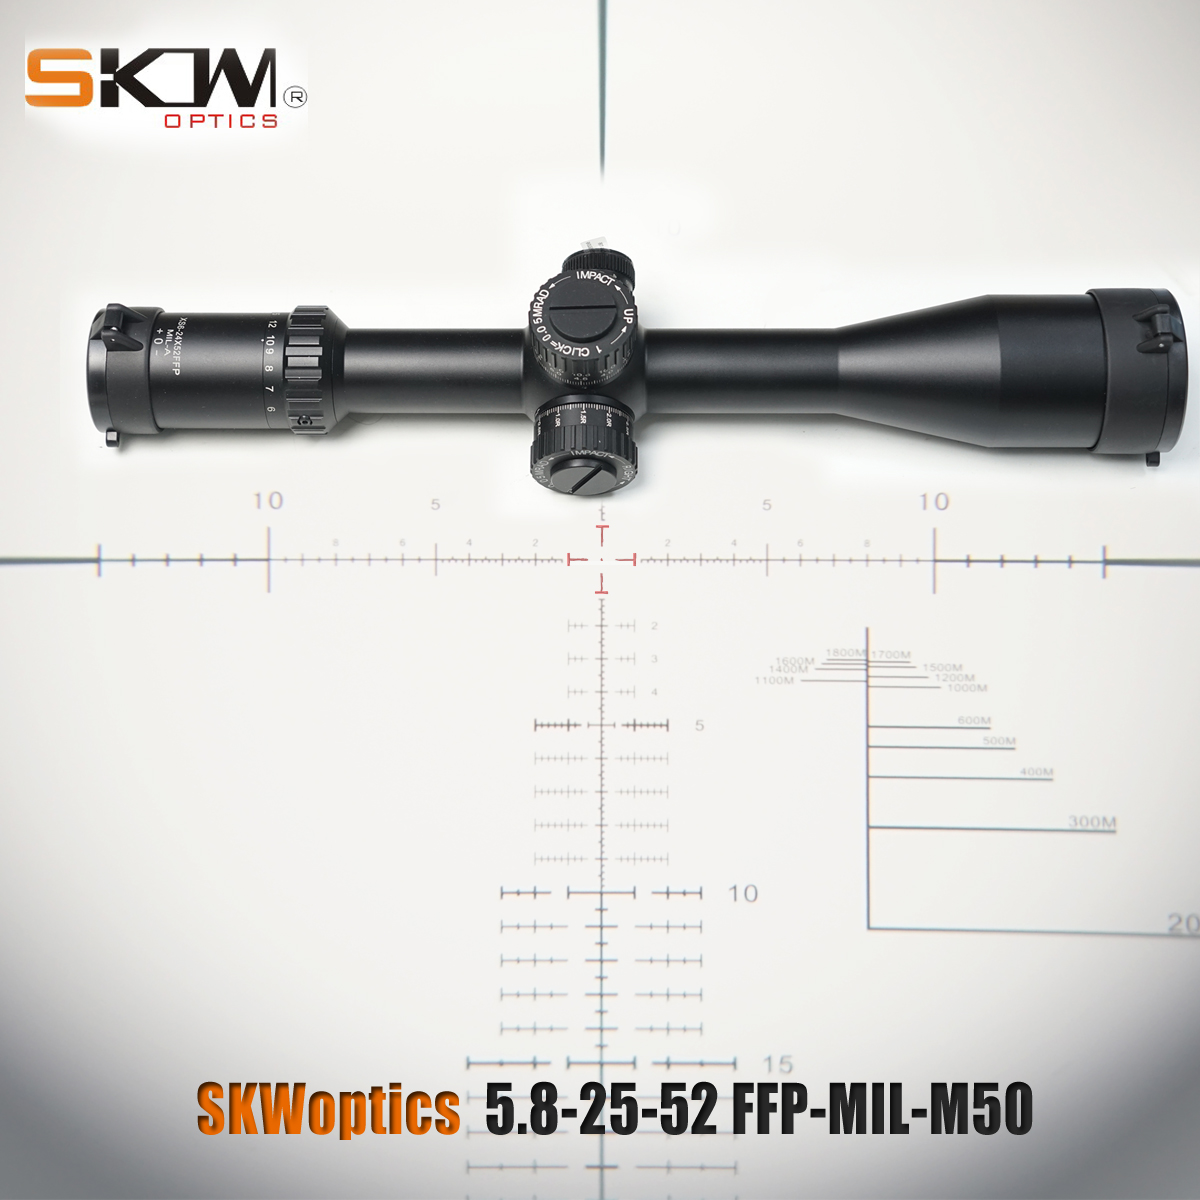 SKWoptics 5.8-25x52FFP-MIL-M50 First Focal Plane ffp rifle scope rings Hunting reticle Heavy duty riflescope long-range scope